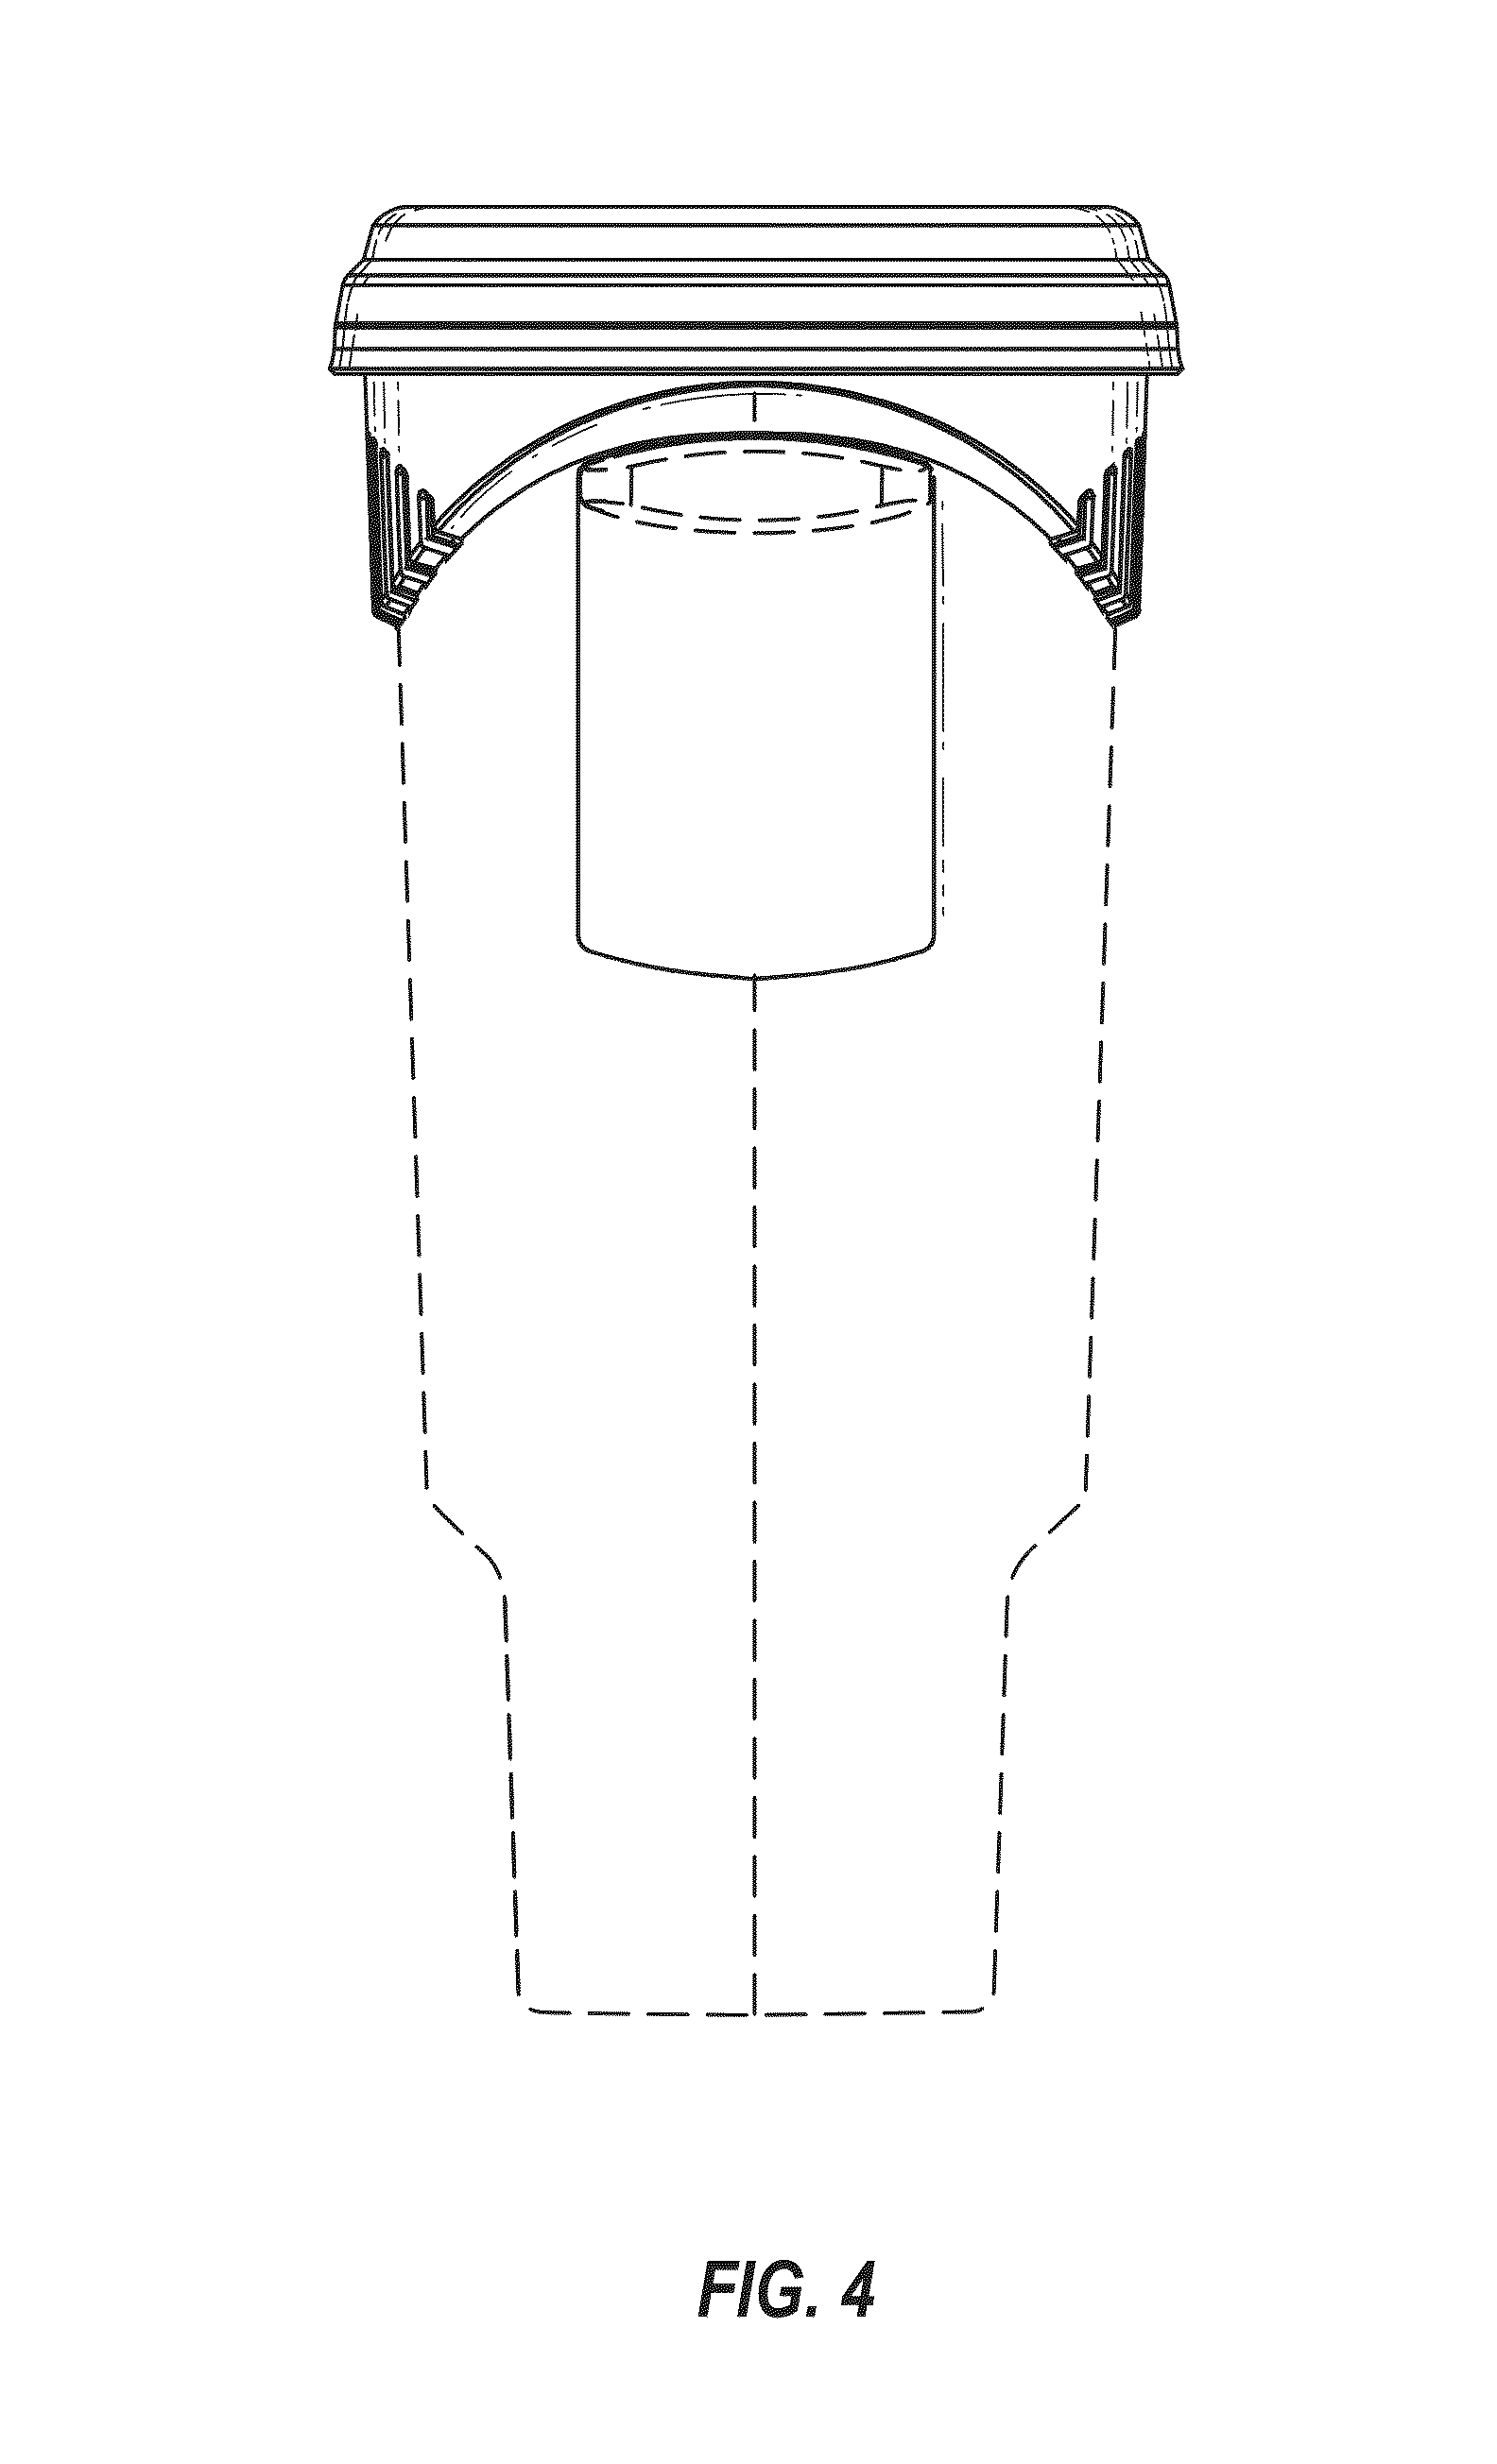 patent usd700531